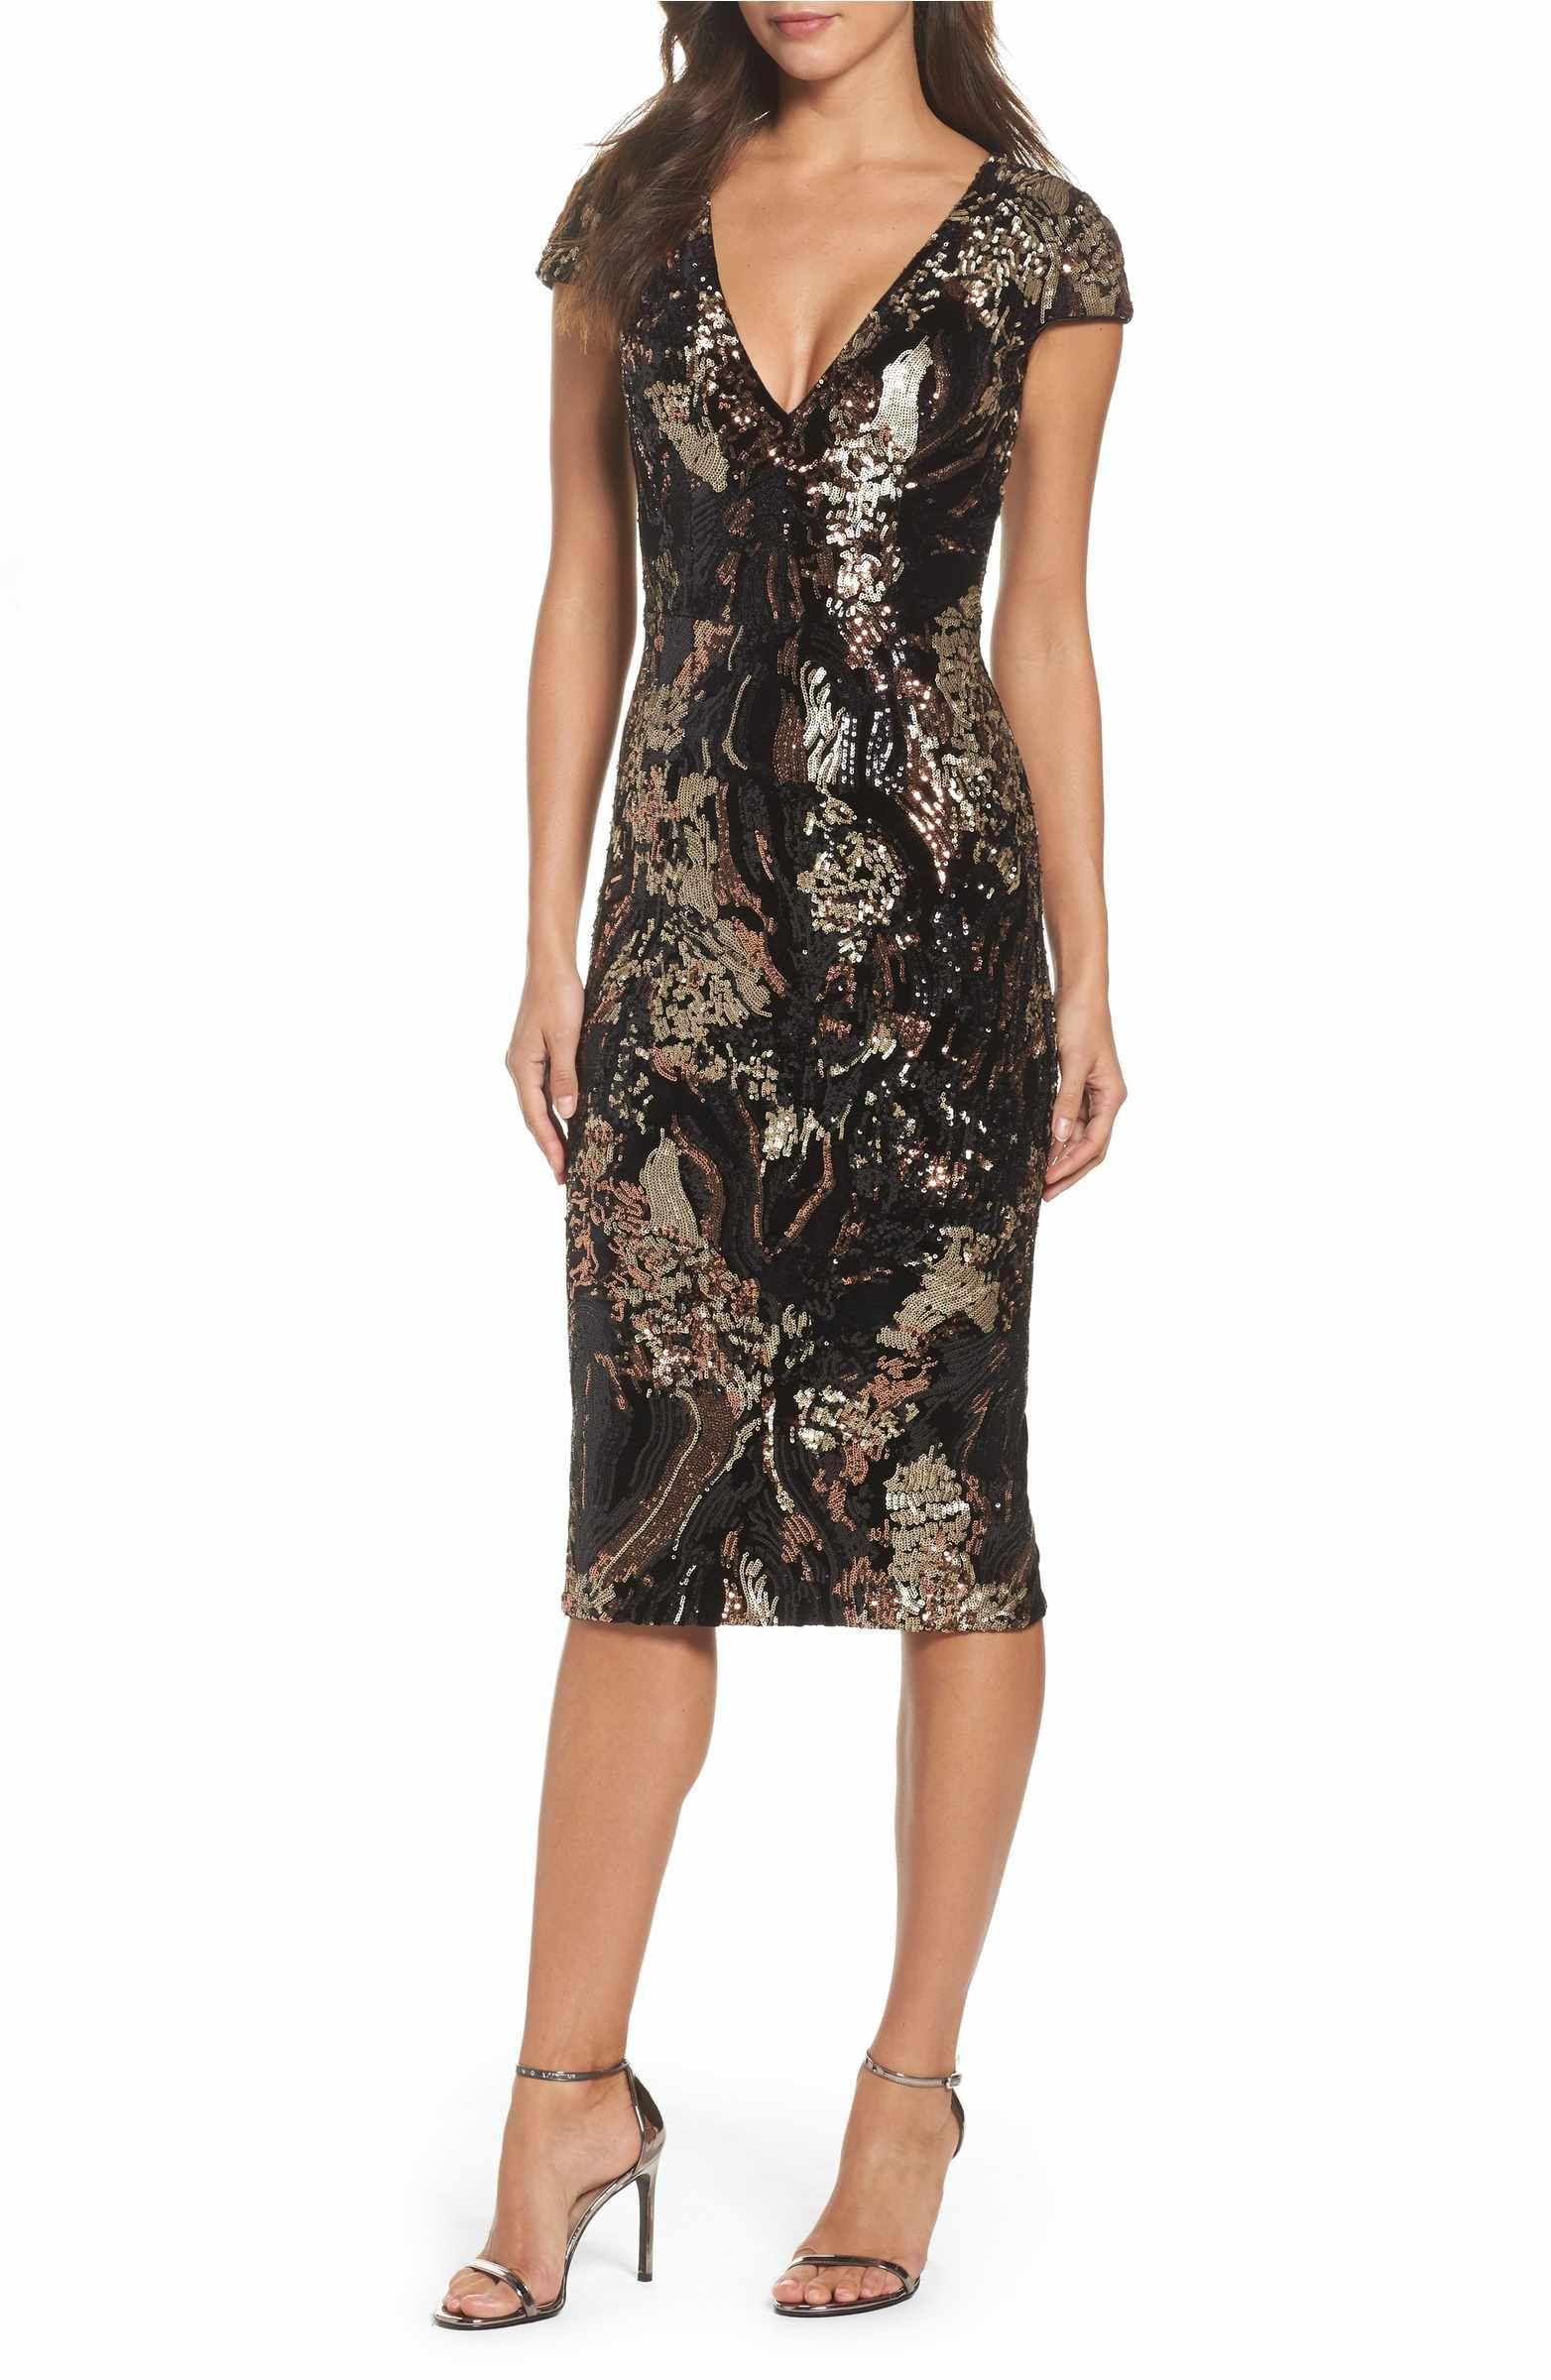 Allison Sequin Velvet Body-Con Dress | Body con, Sequins and Nordstrom